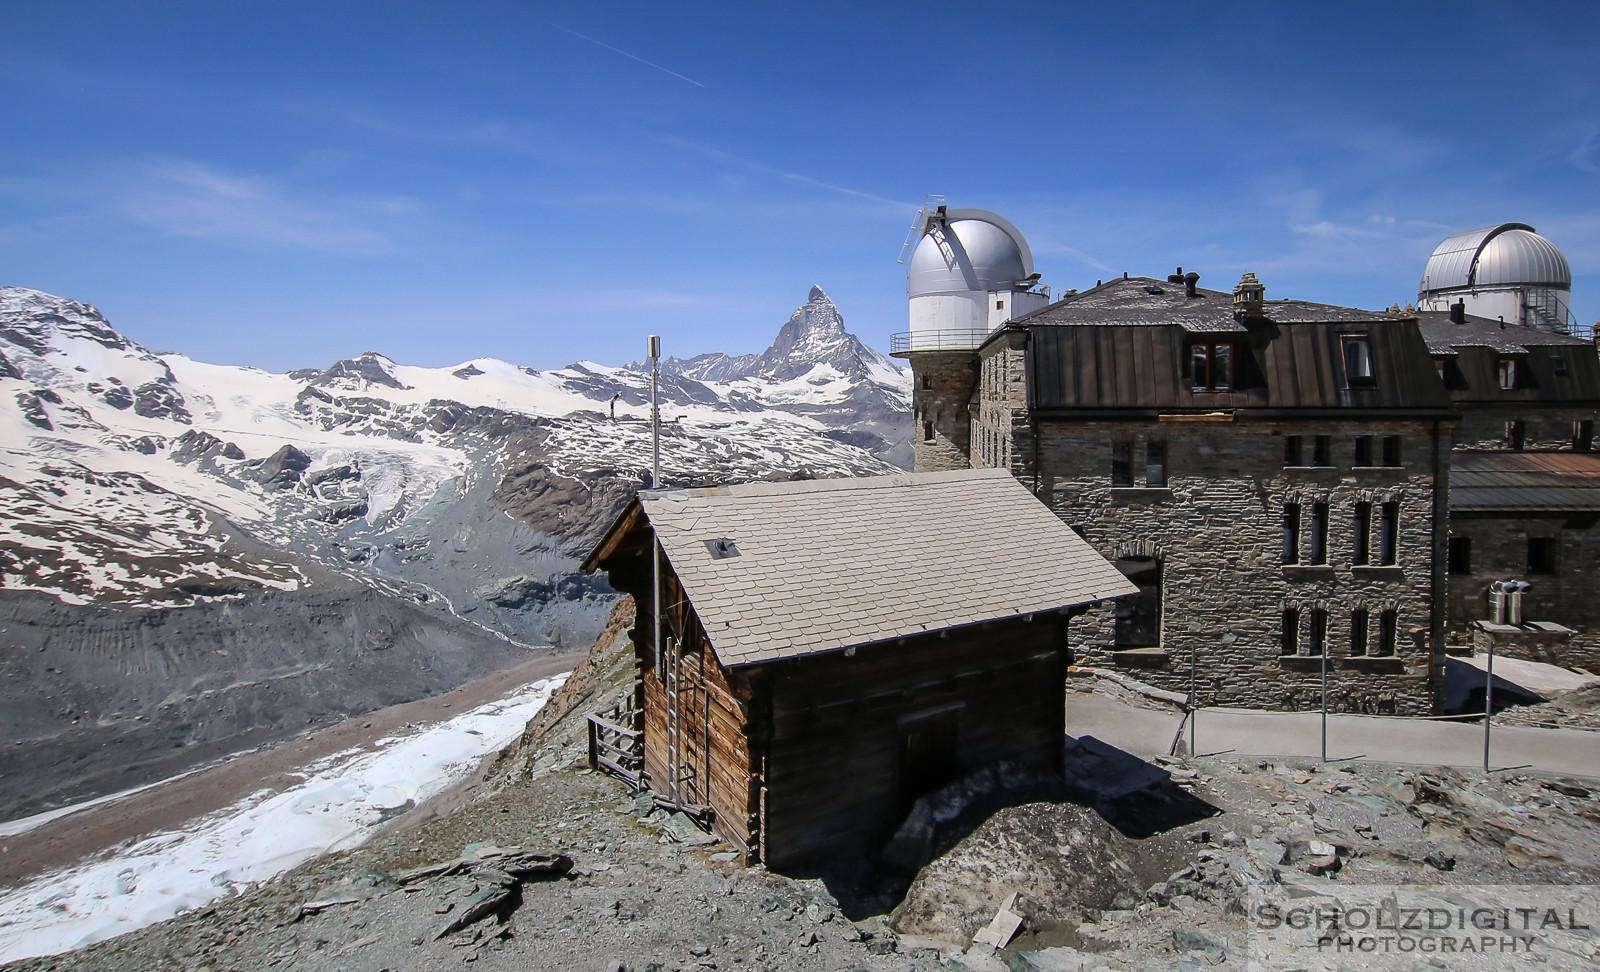 Switzerland, Schweiz, Matterhorn, Hiking, Wandern, Gletscher, Gornergrat, Riffelalp, Riffelalm, Mark Twain, Alpen, Zermatt